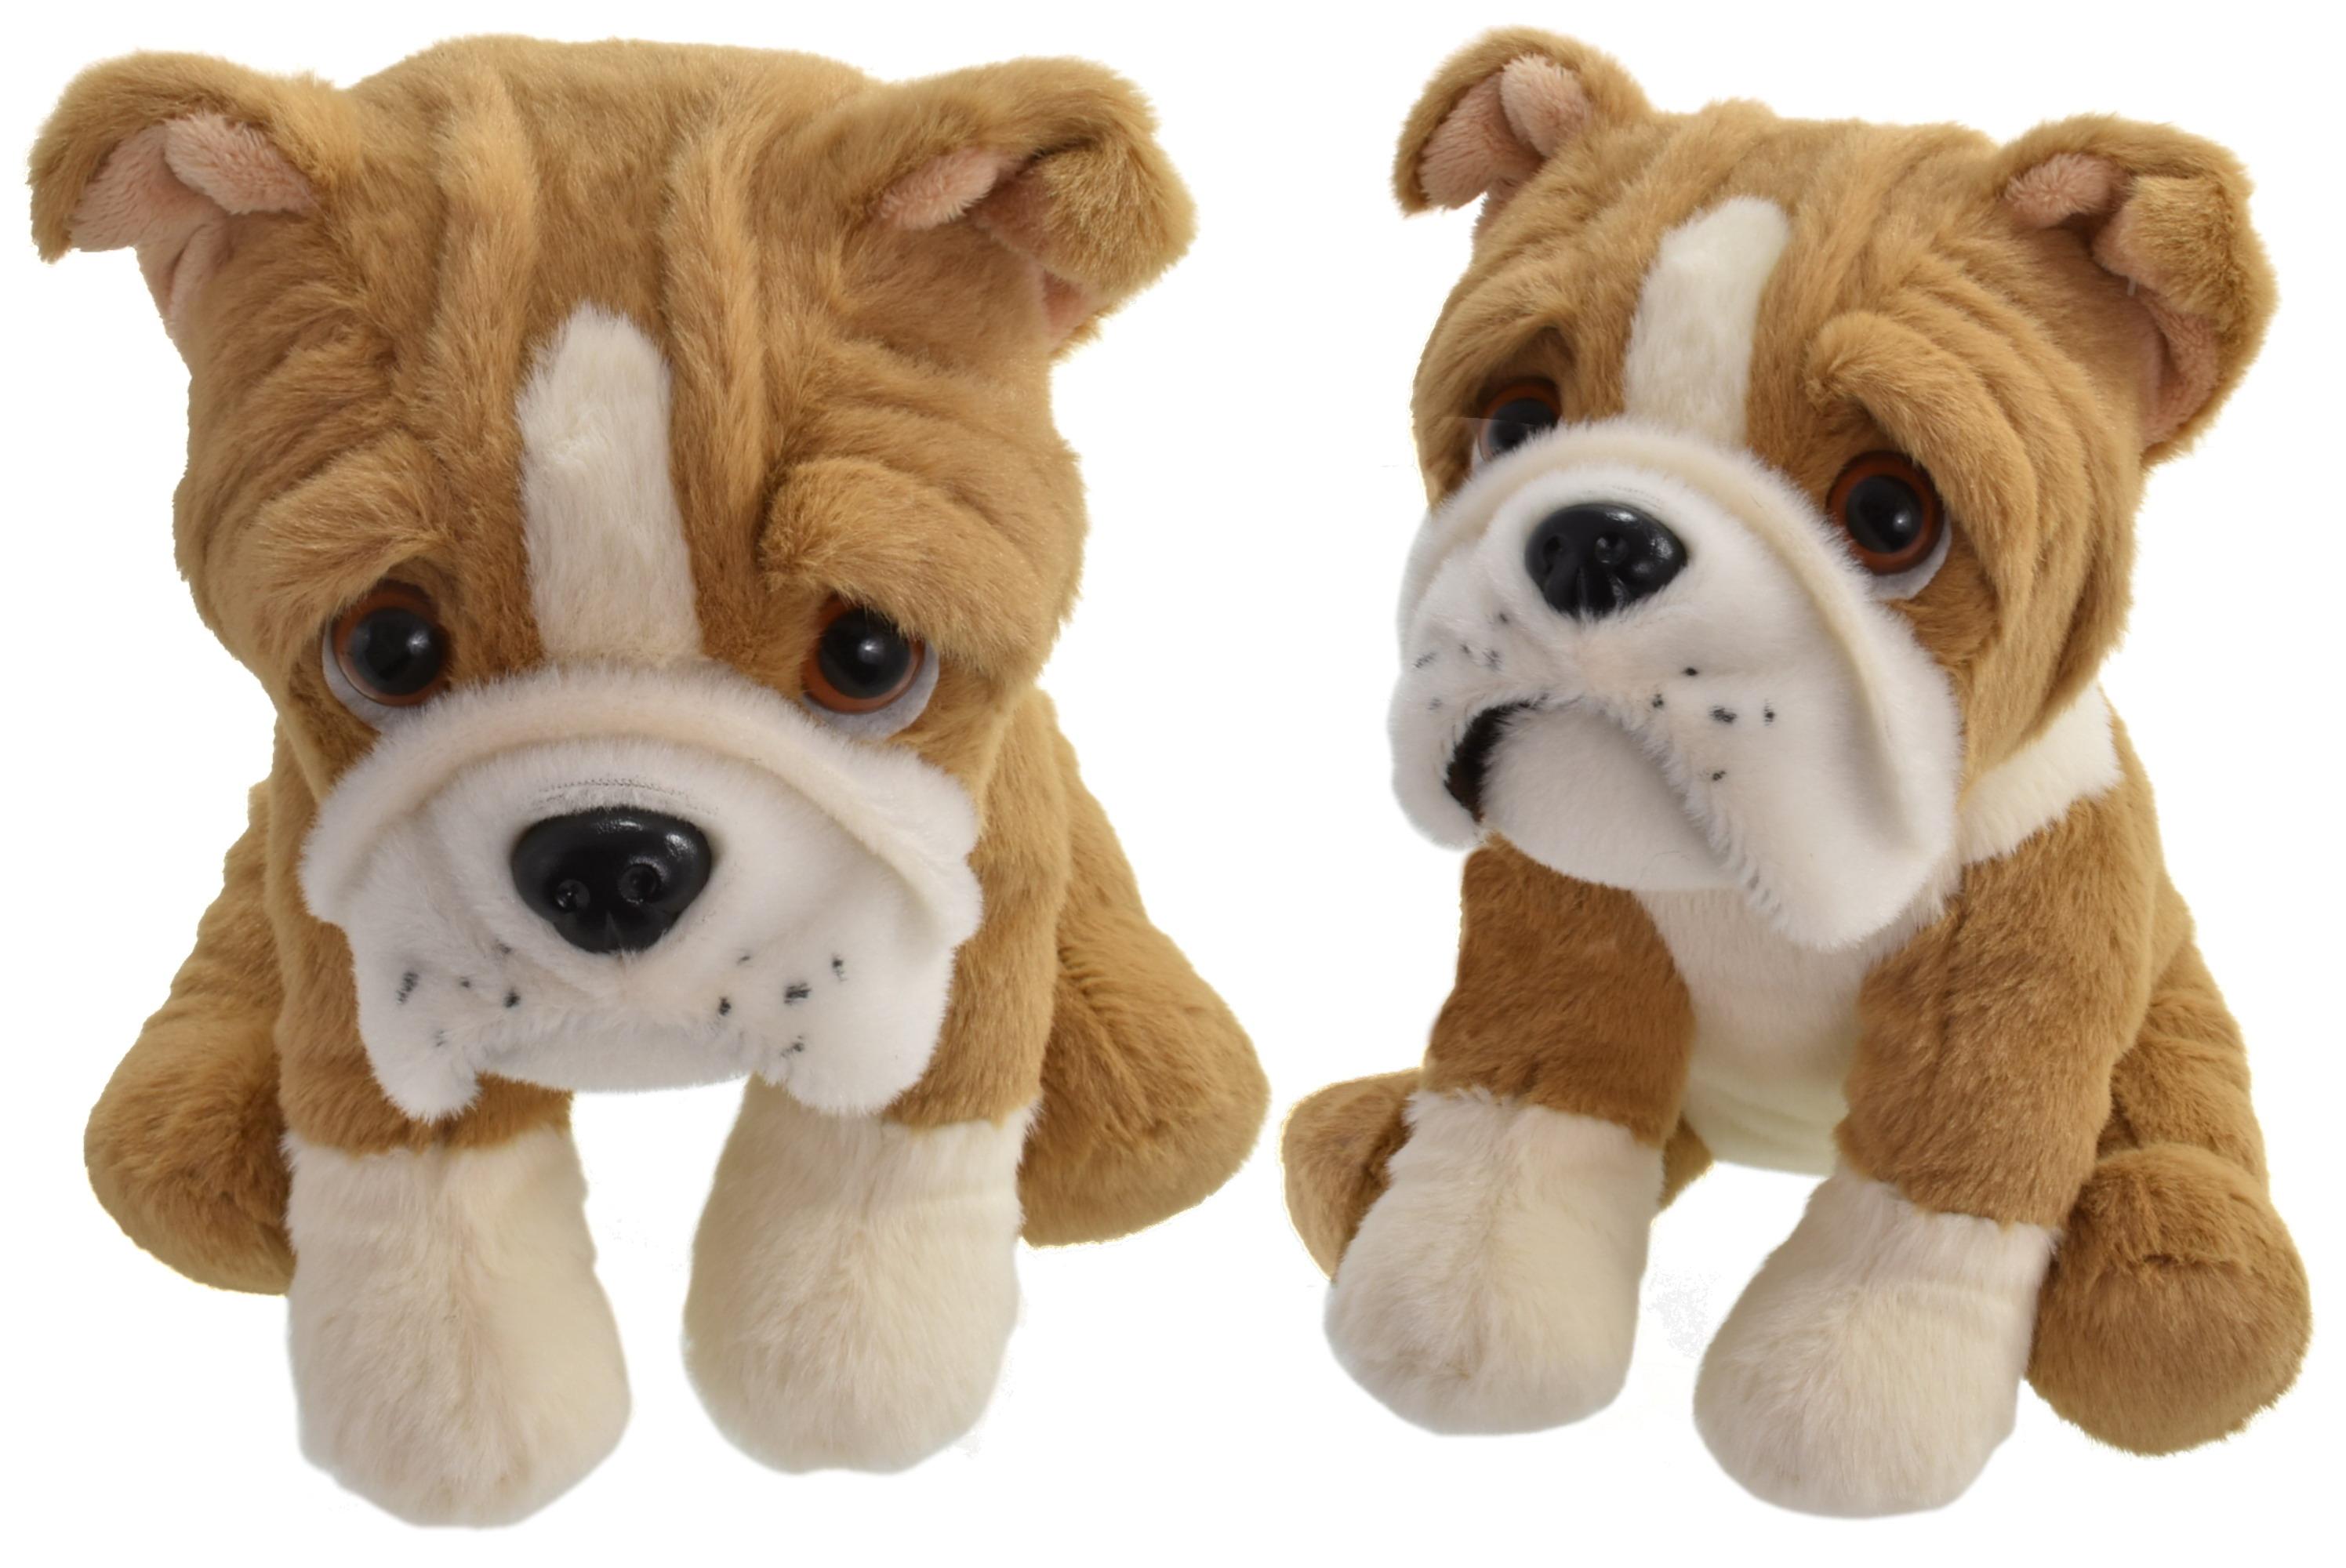 20cm Plush Sitting Pug Dog